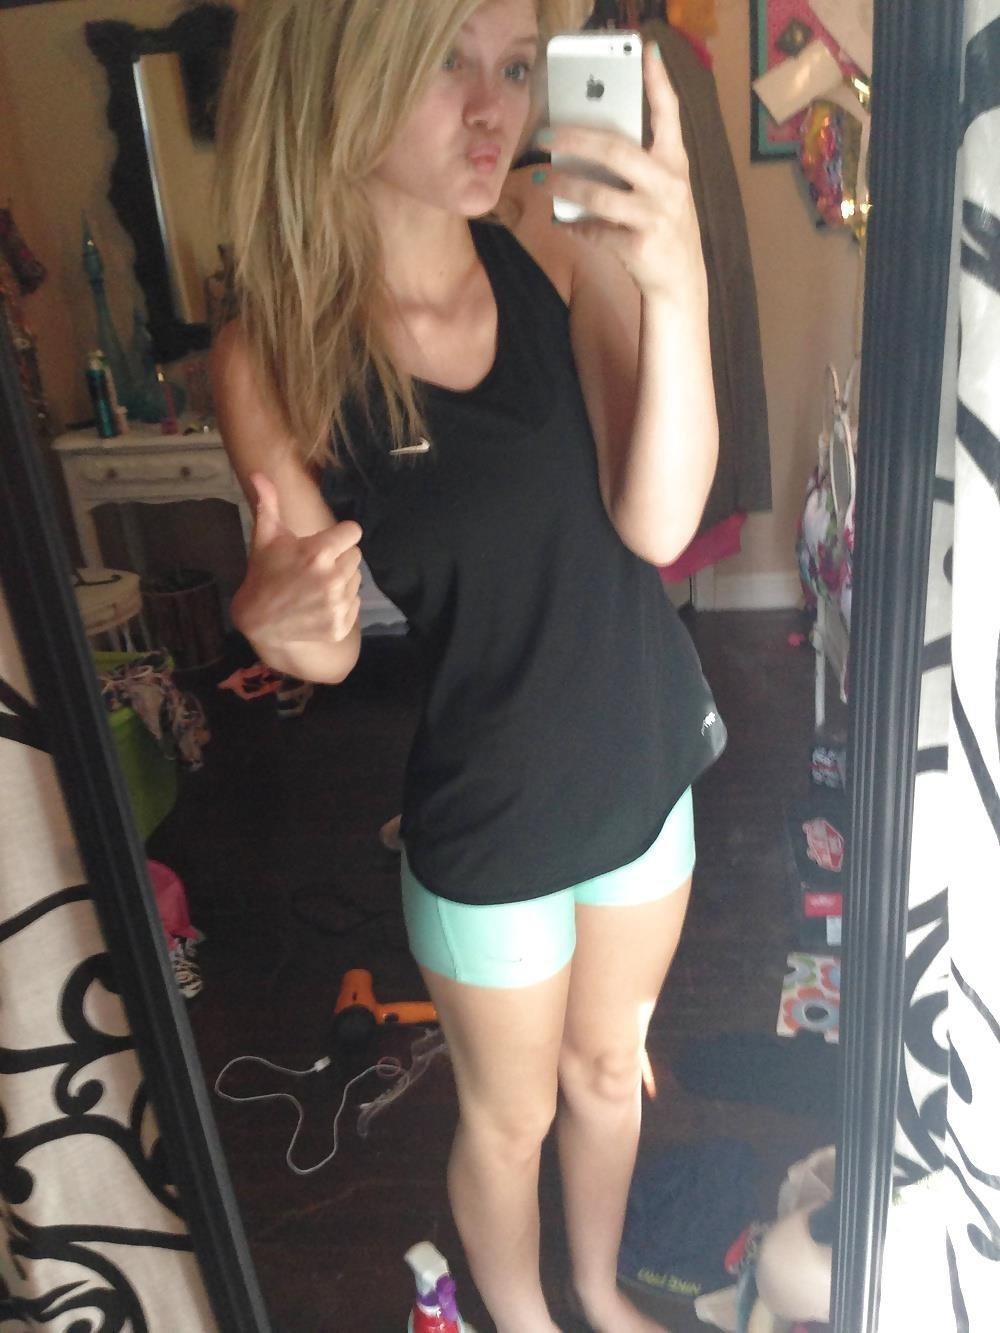 Busty teen nude selfie-4650